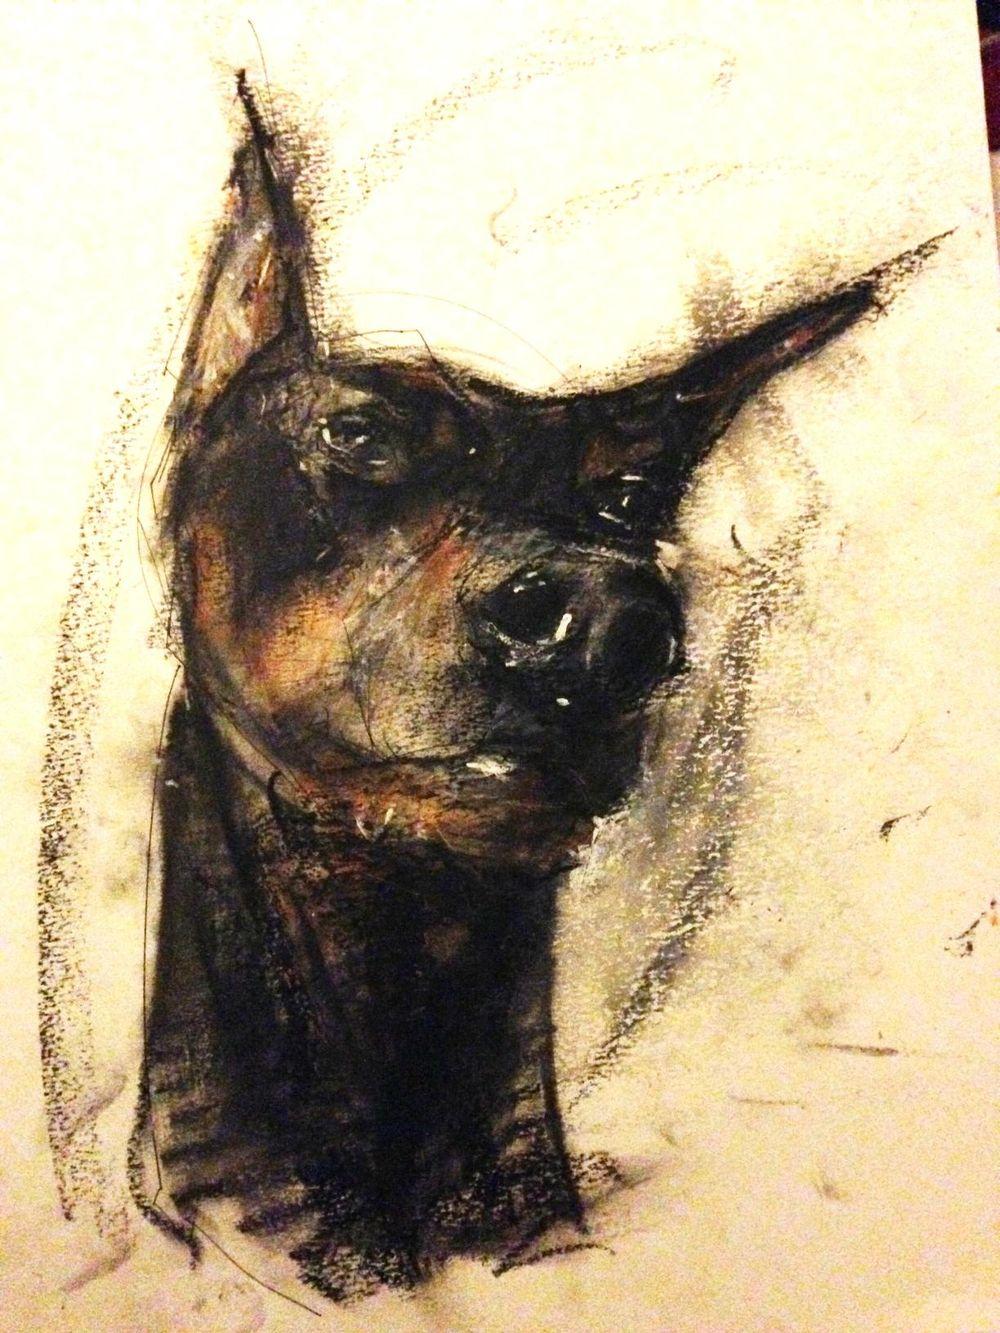 Dog Tattoo - image 1 - student project